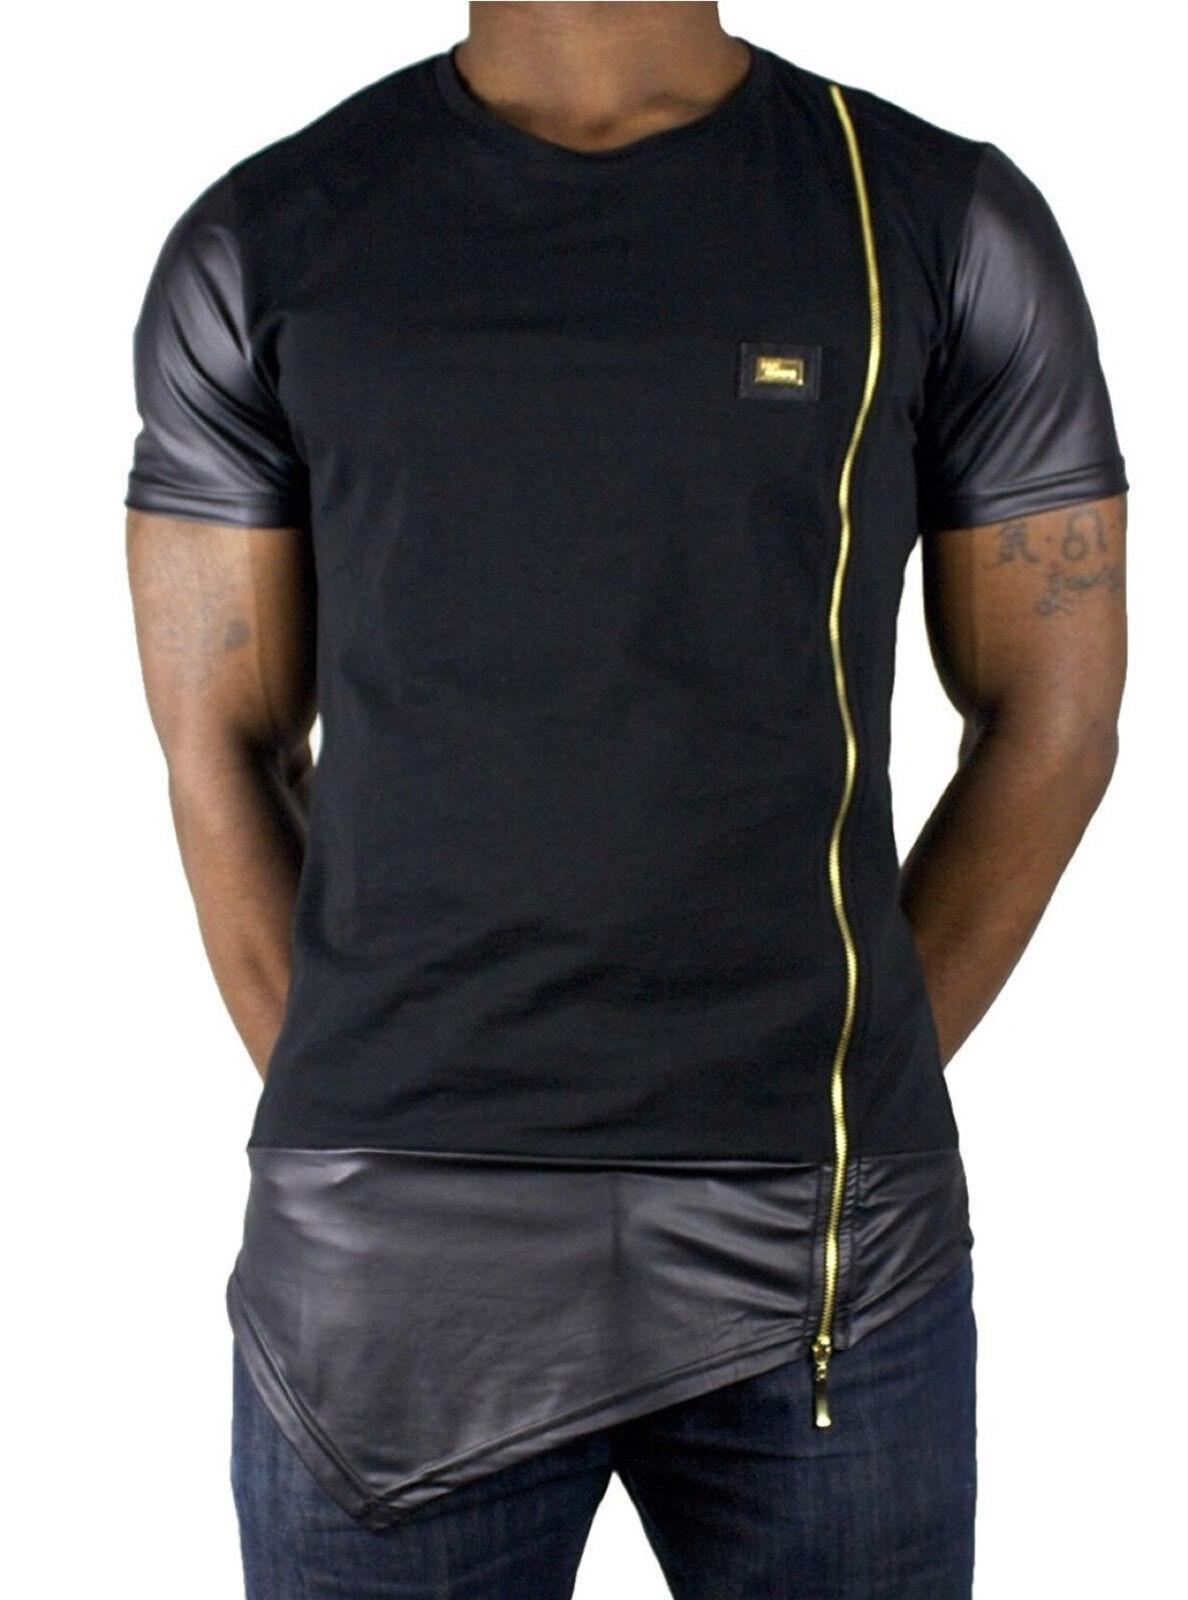 Time Is Money Reißverschluss Stern Club T-Shirts,Pu G Herren & Jungen Hip Hop   | Sonderangebot  | Haltbar  | Outlet Store Online